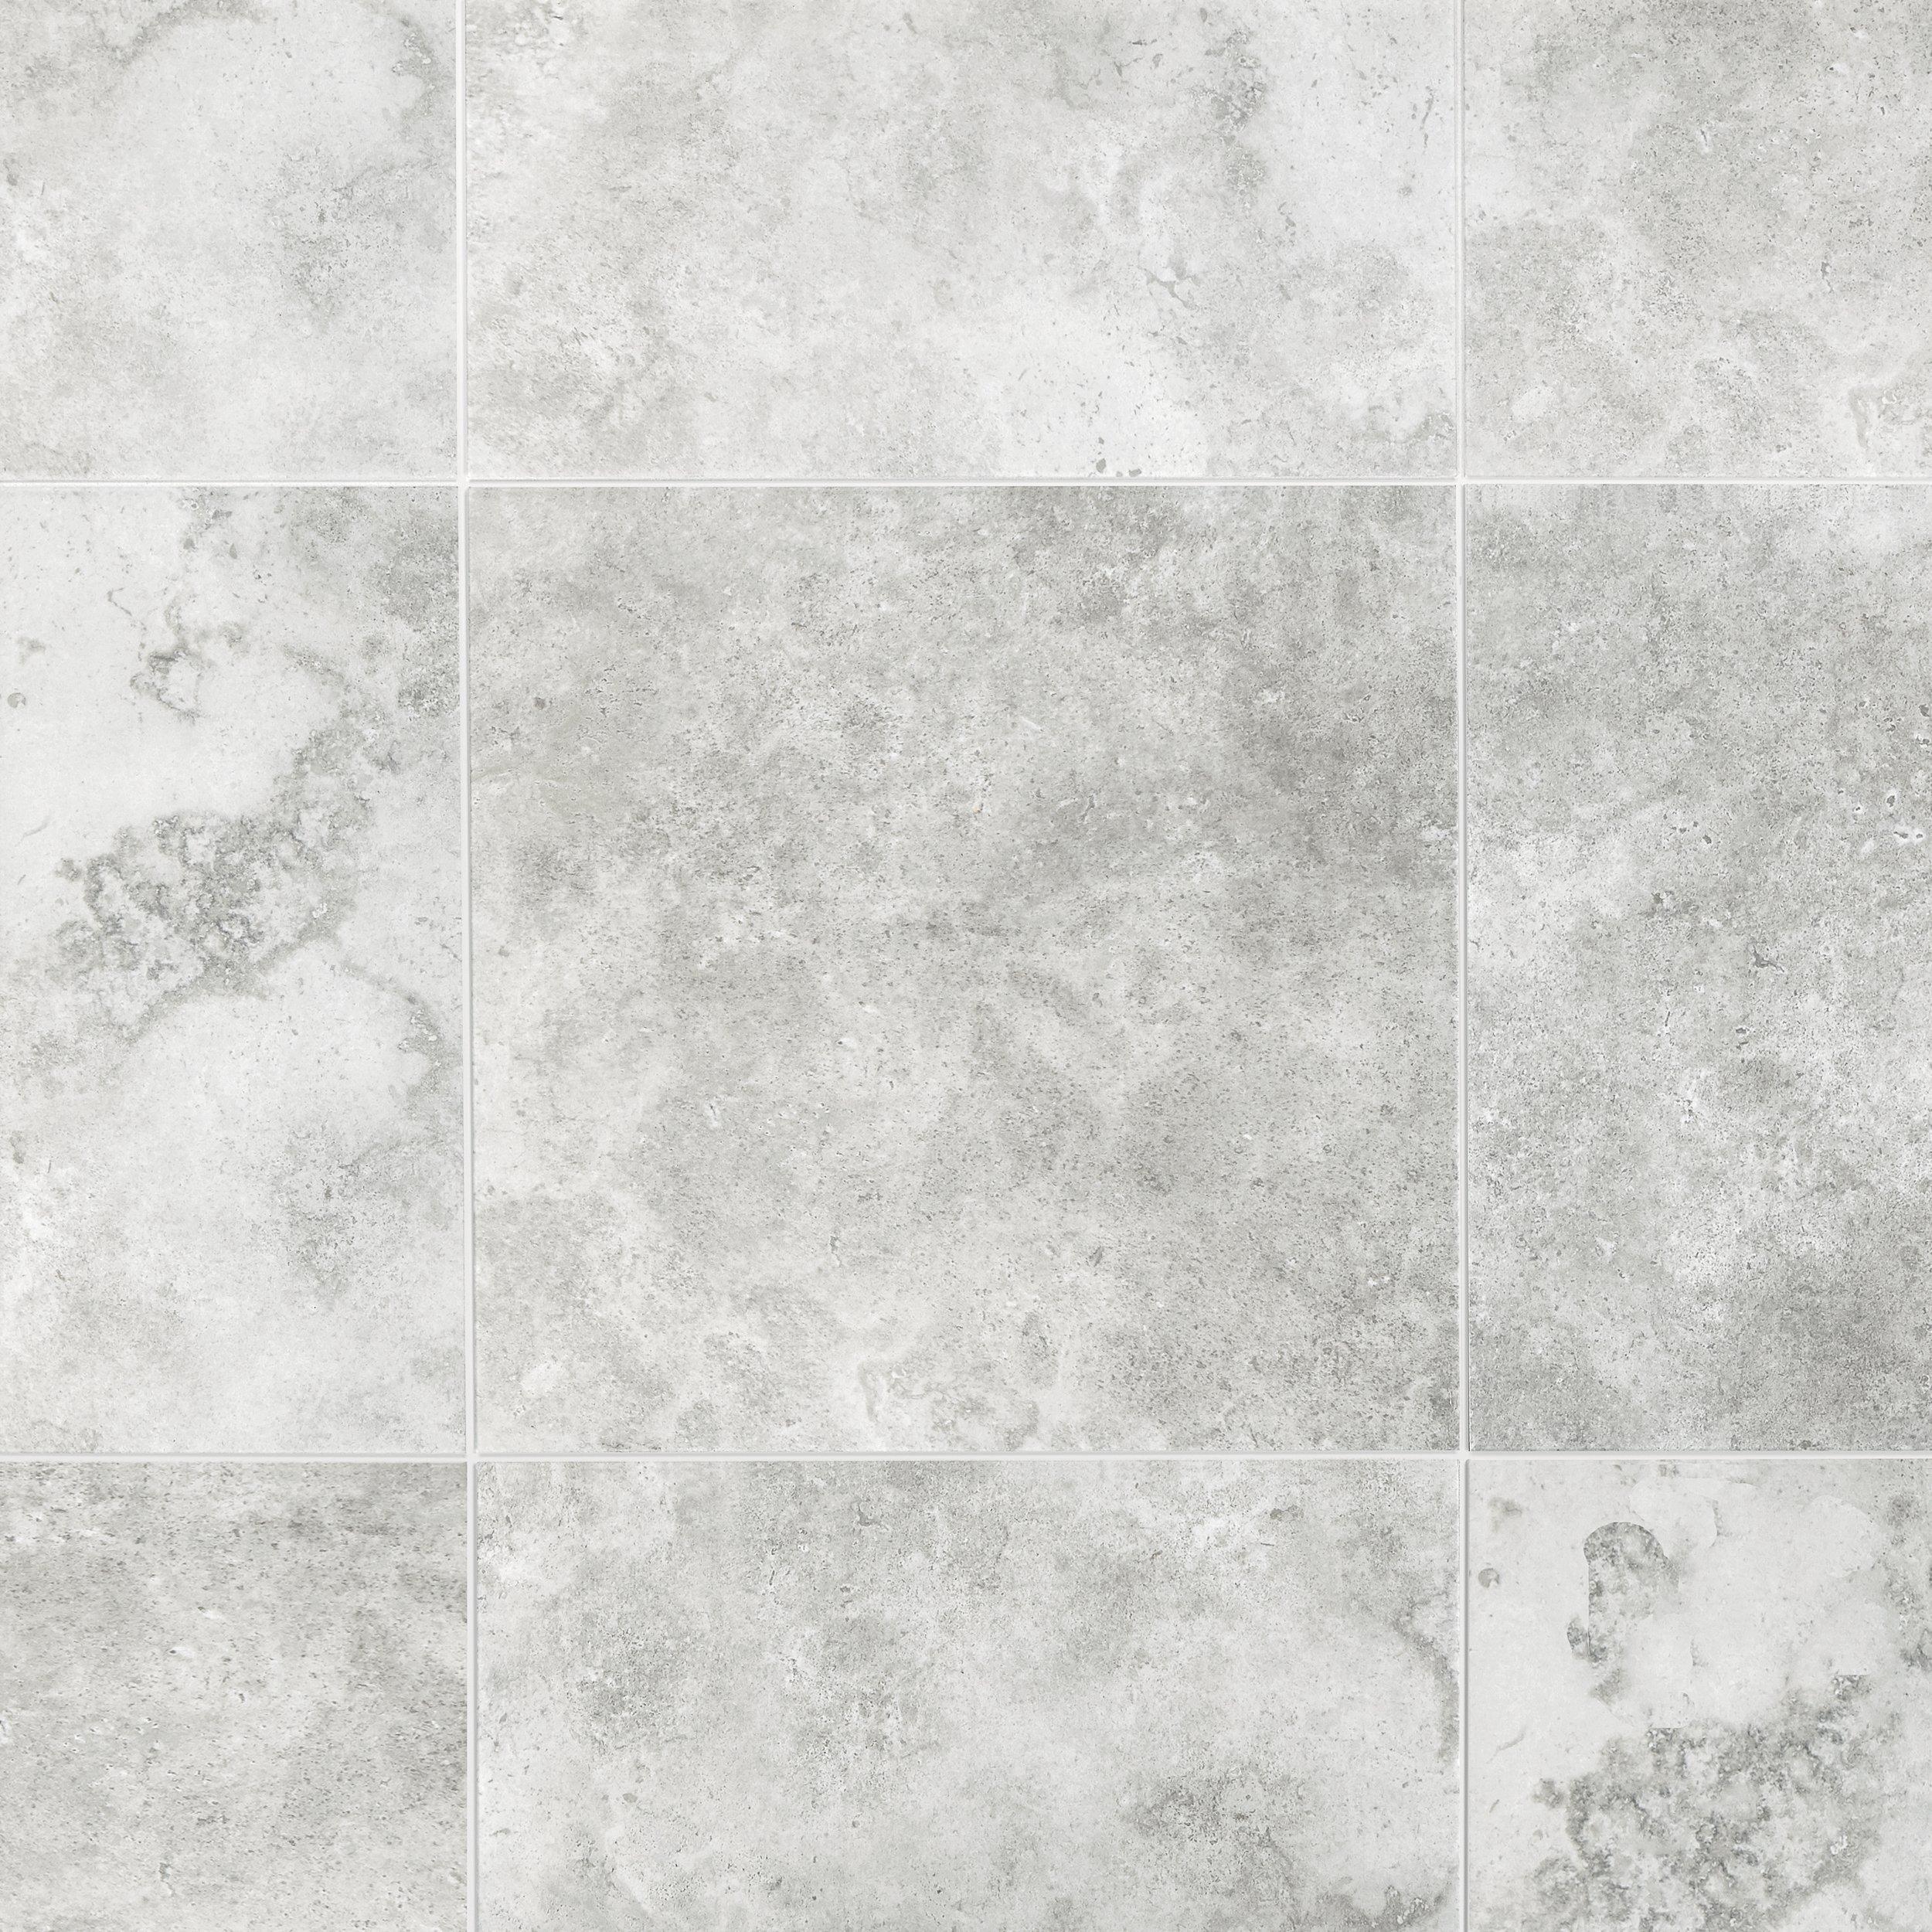 Stone look tile floor decor stockton ash porcelain tile dailygadgetfo Image collections